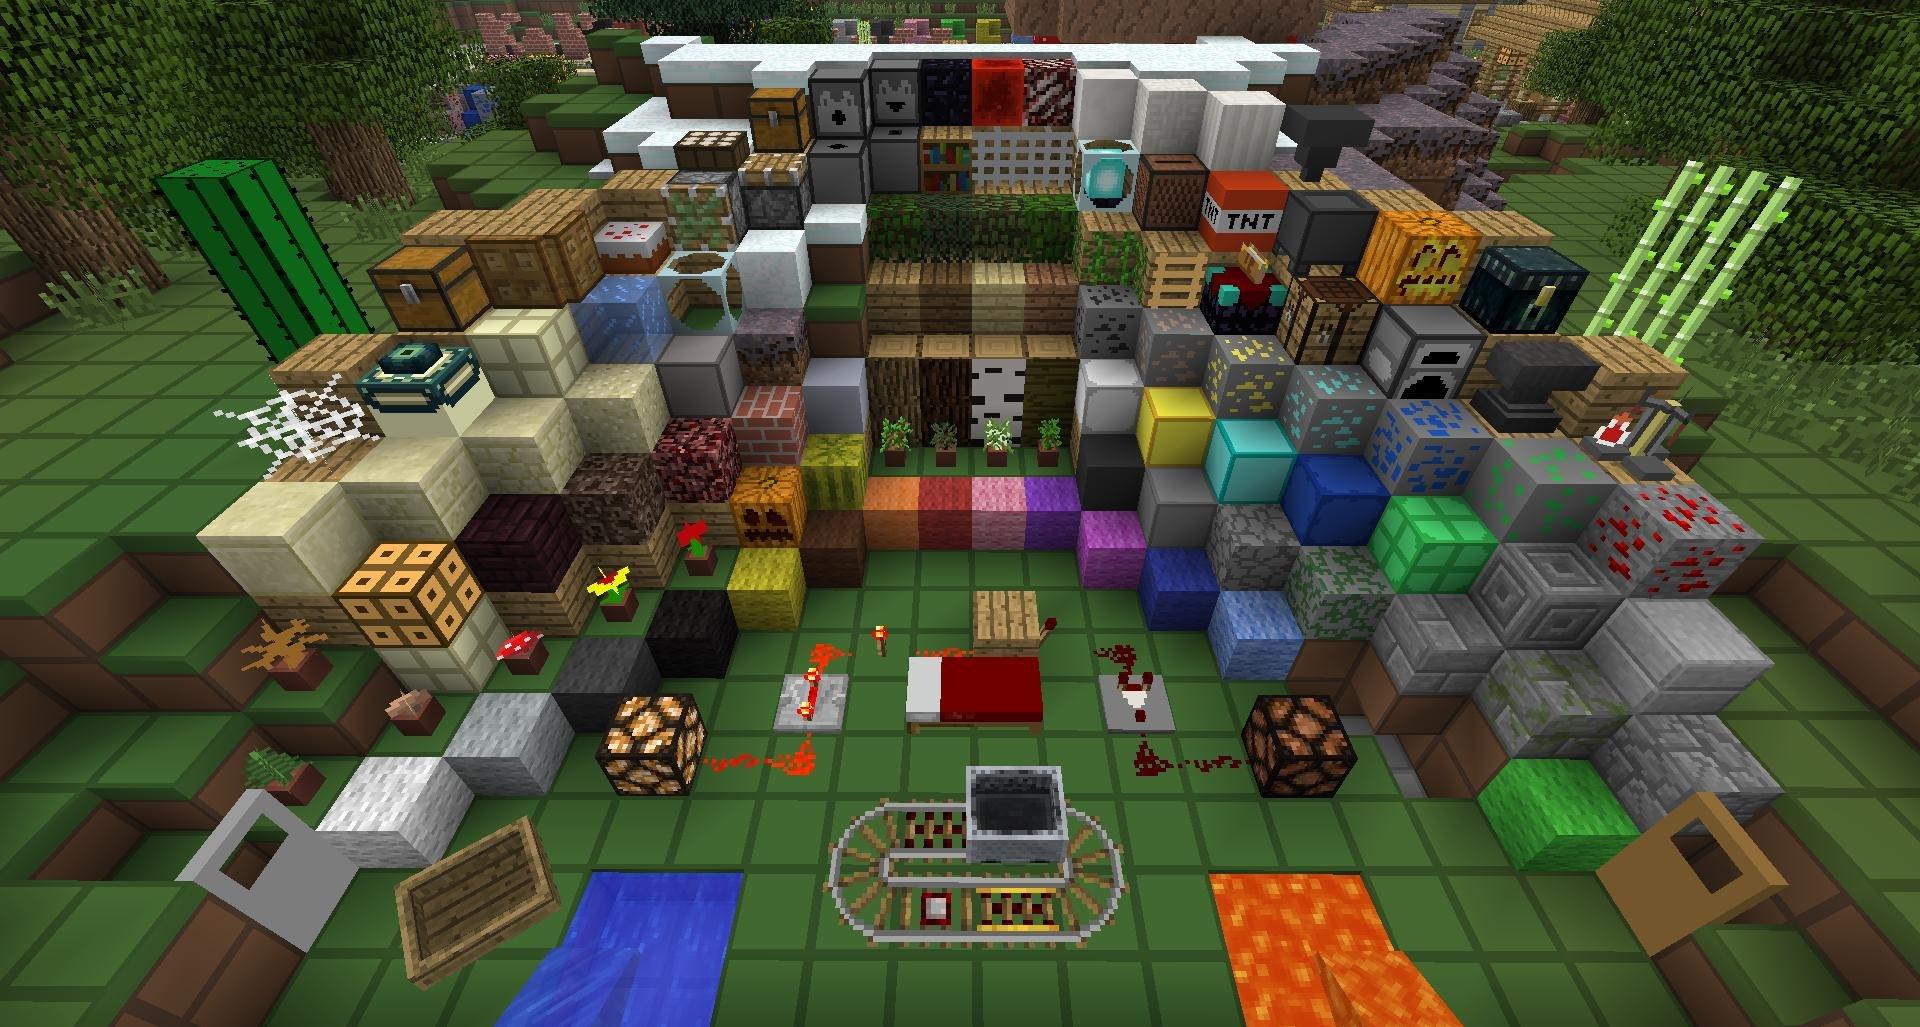 Текстур-паки для Майнкрафт | Minecraft 1.8.9, 1.8.8, 1.8